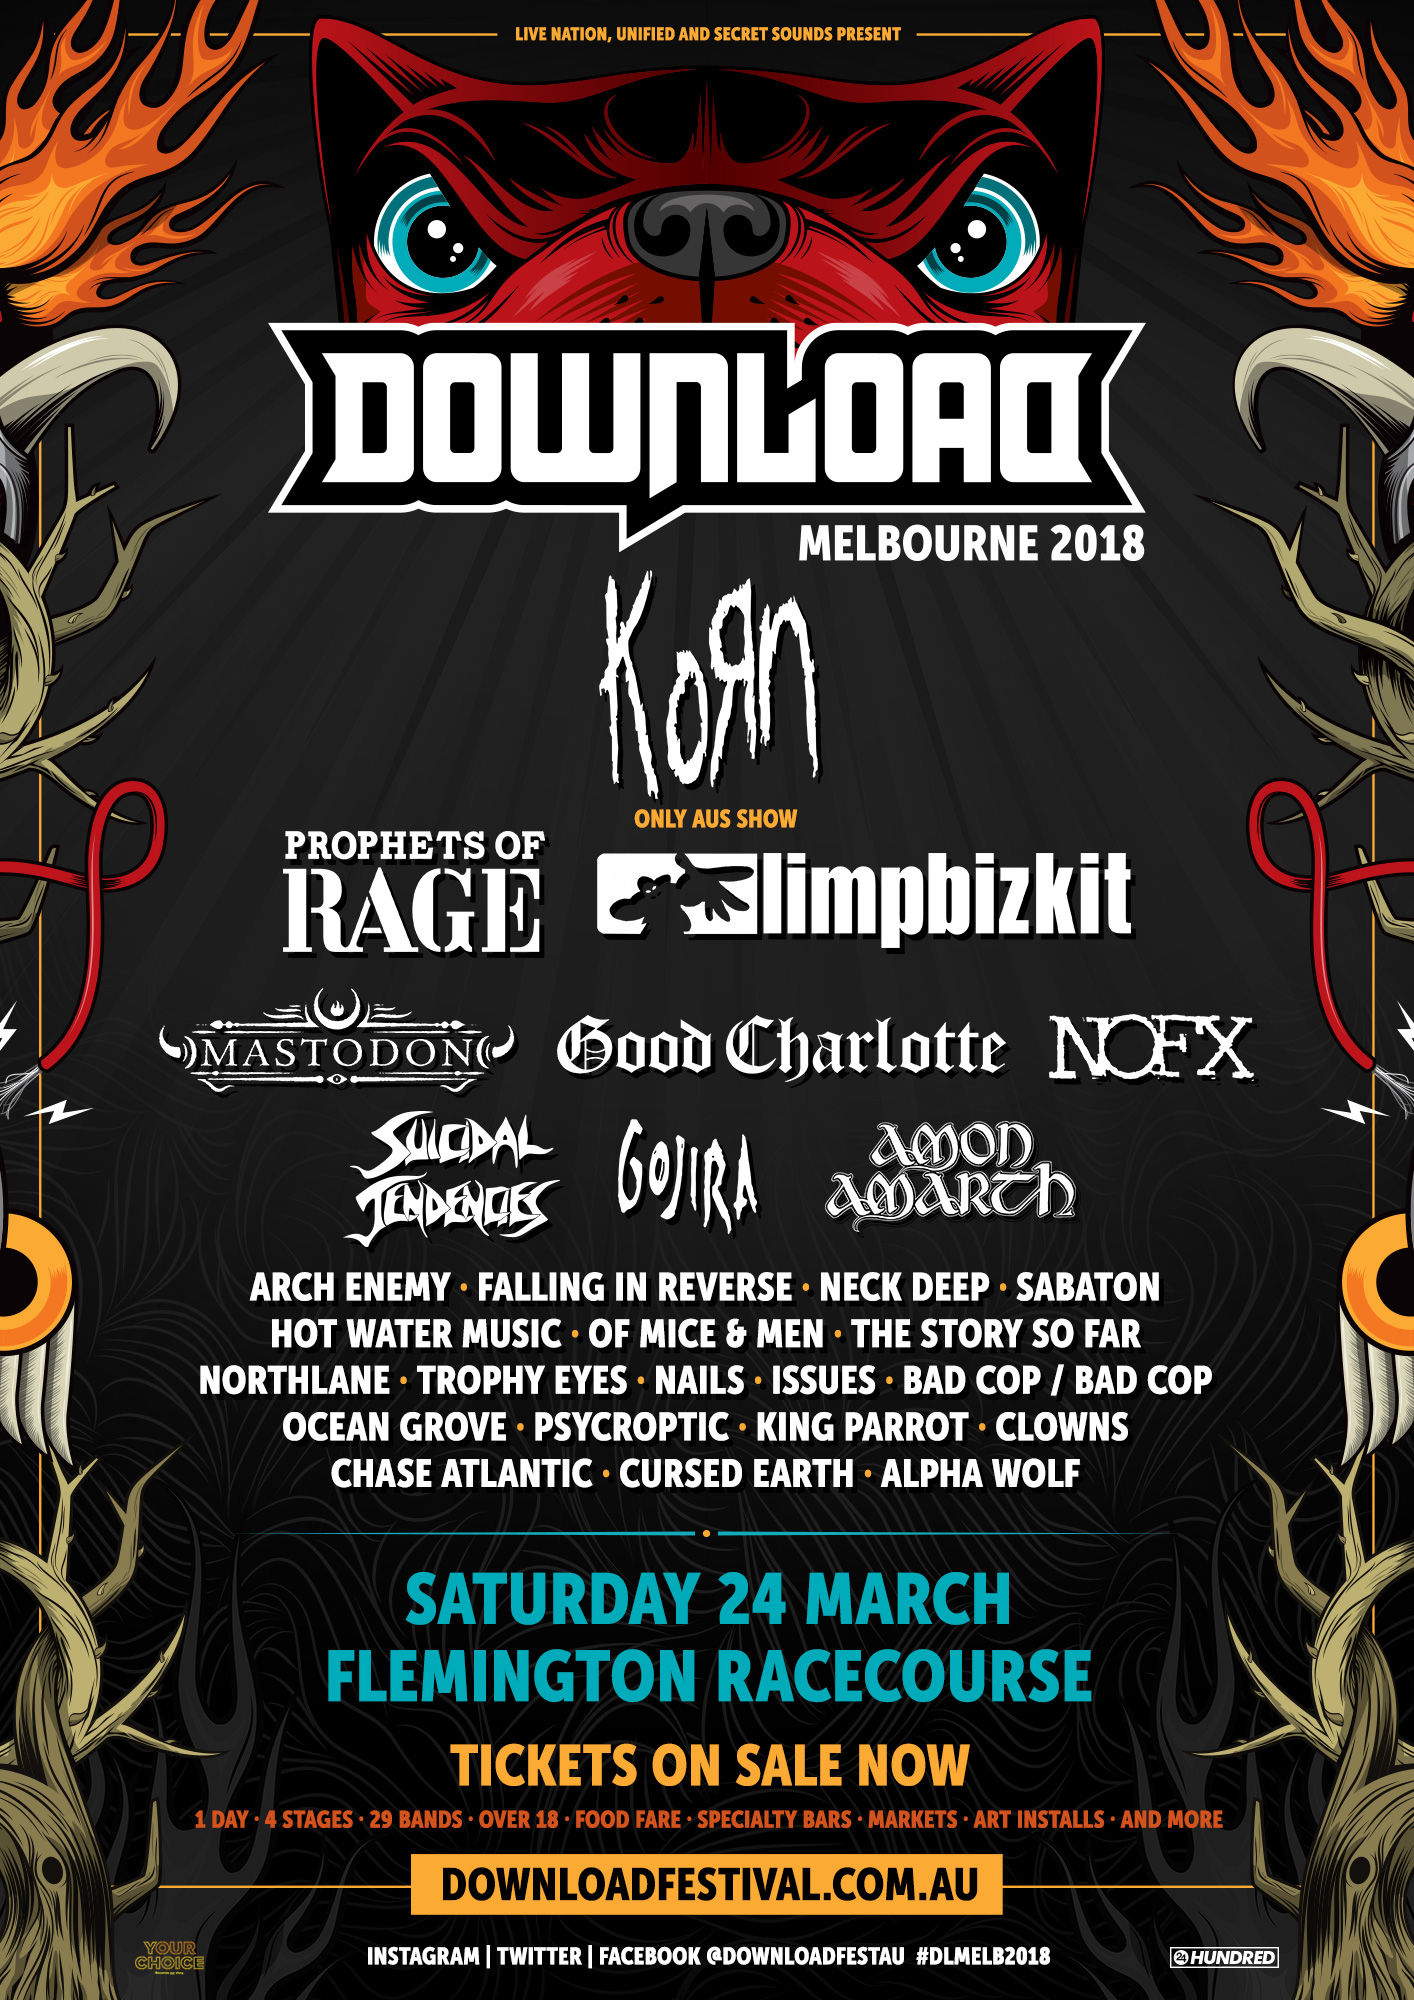 Download Festival 2018 – Melbourne